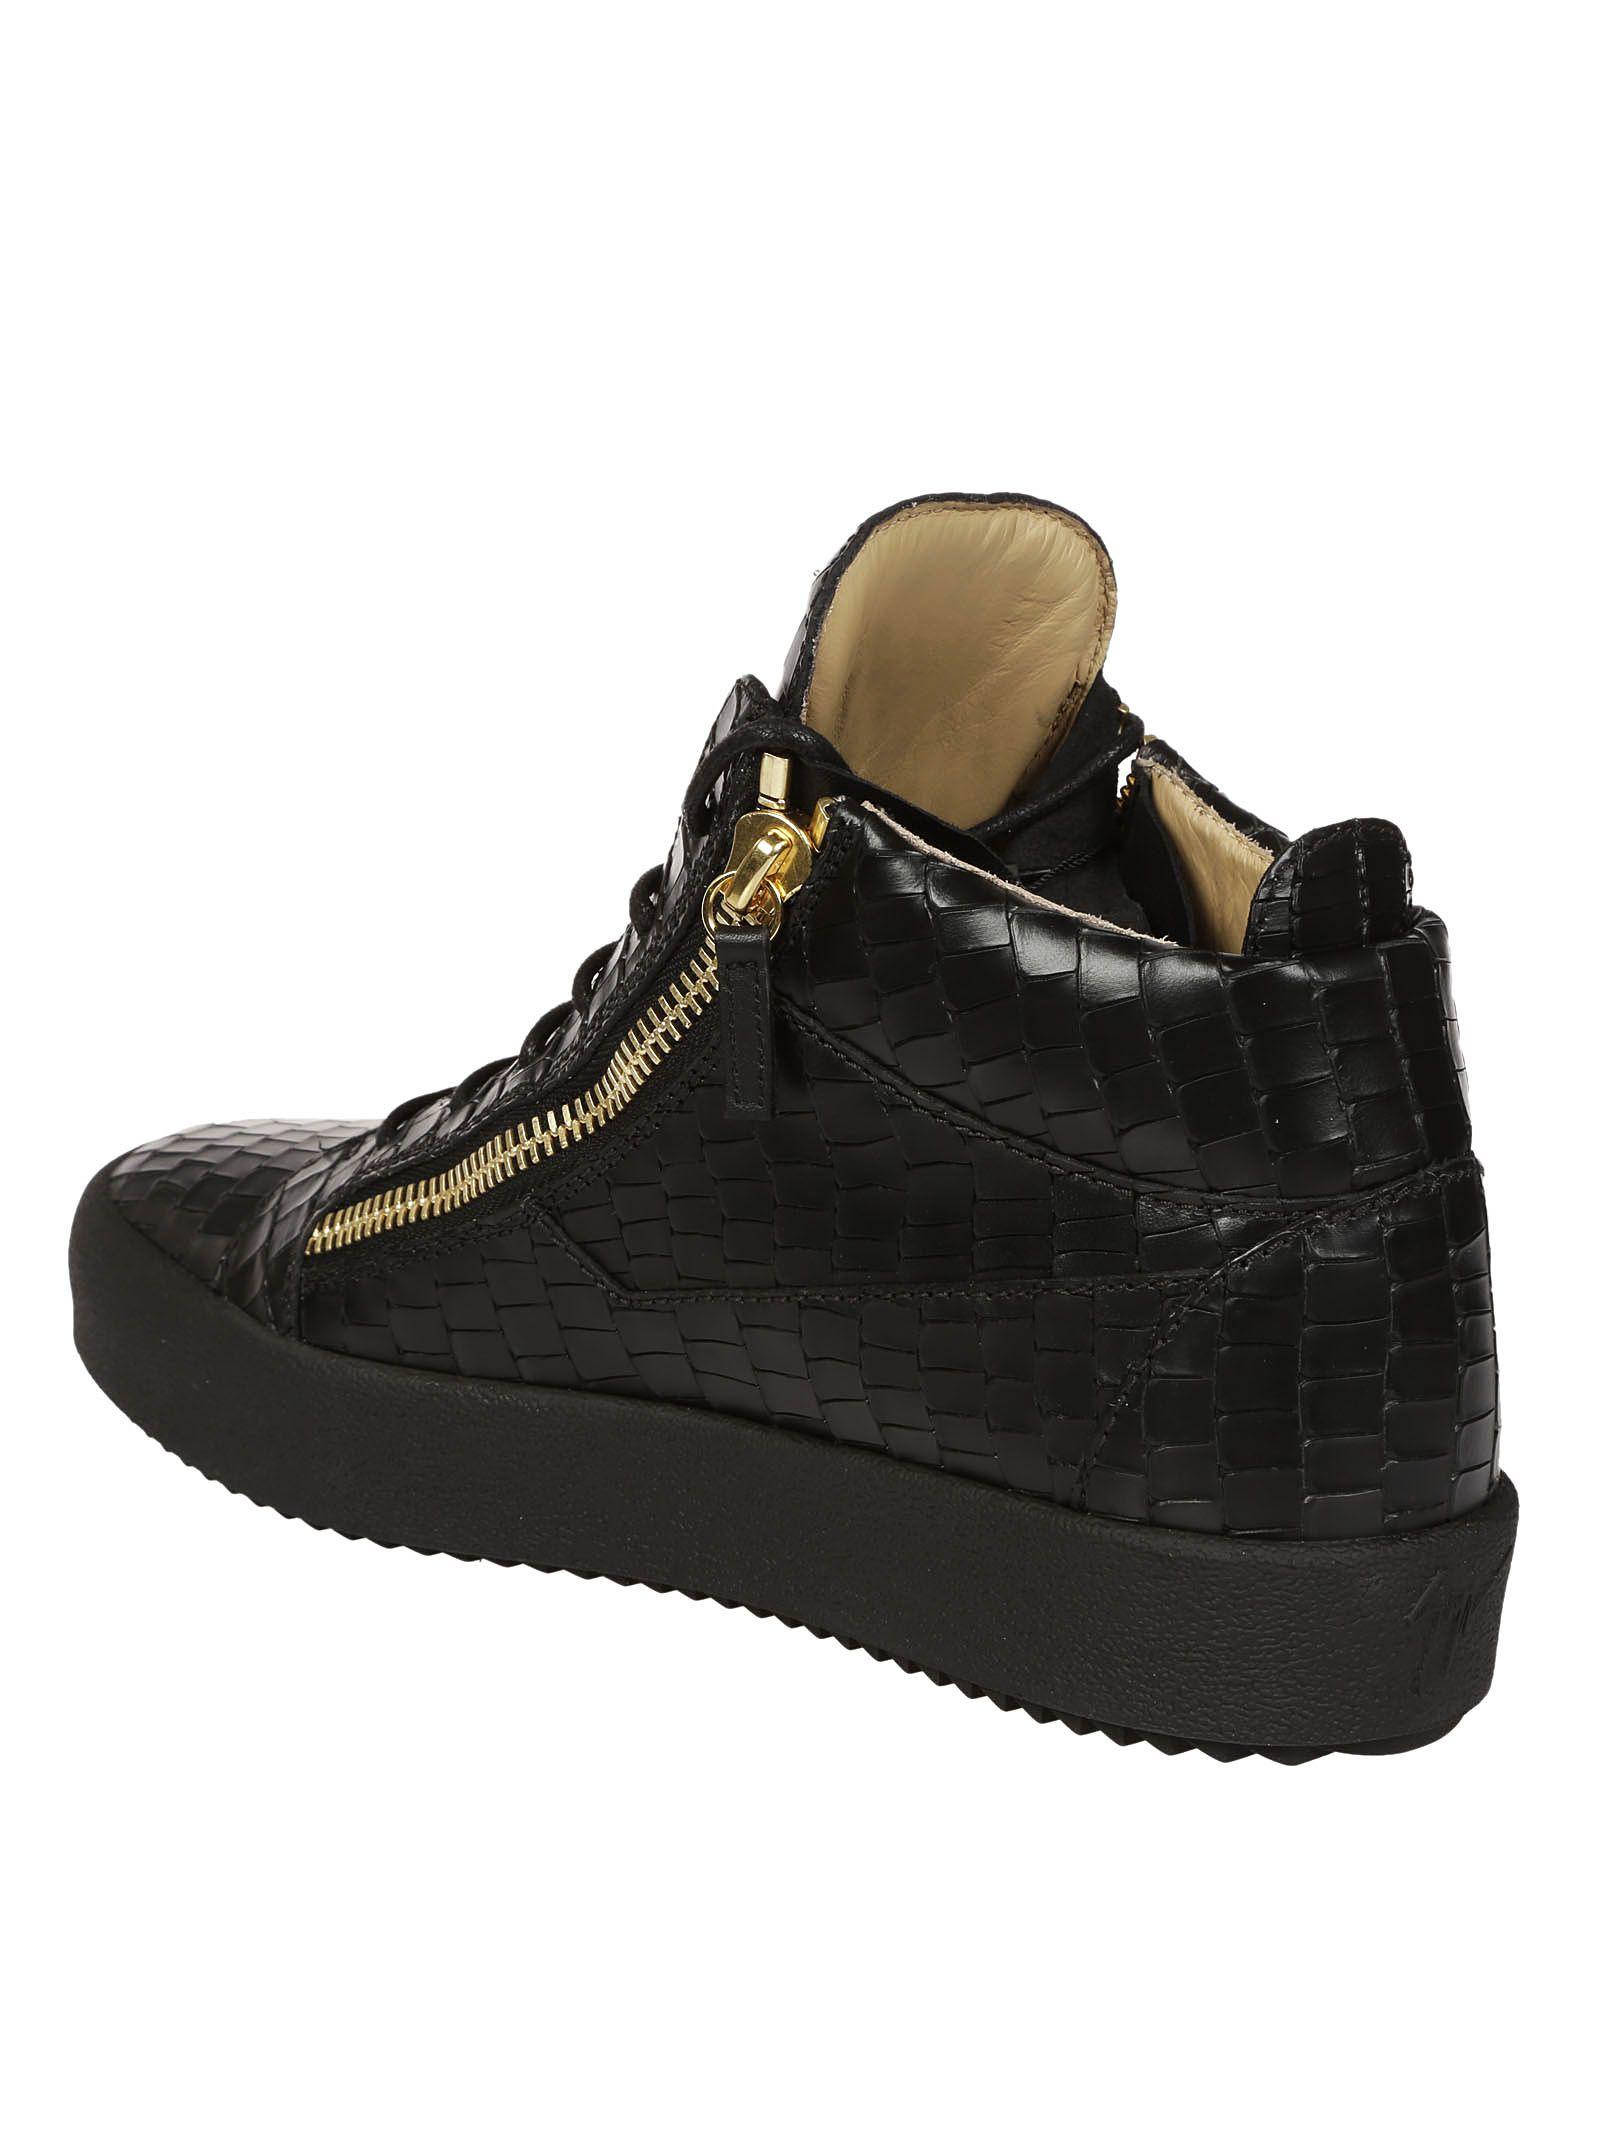 e1a13a14715a Giuseppe Zanotti Giuseppe Zanotti Kriss Hi-top Sneakers - Black ...